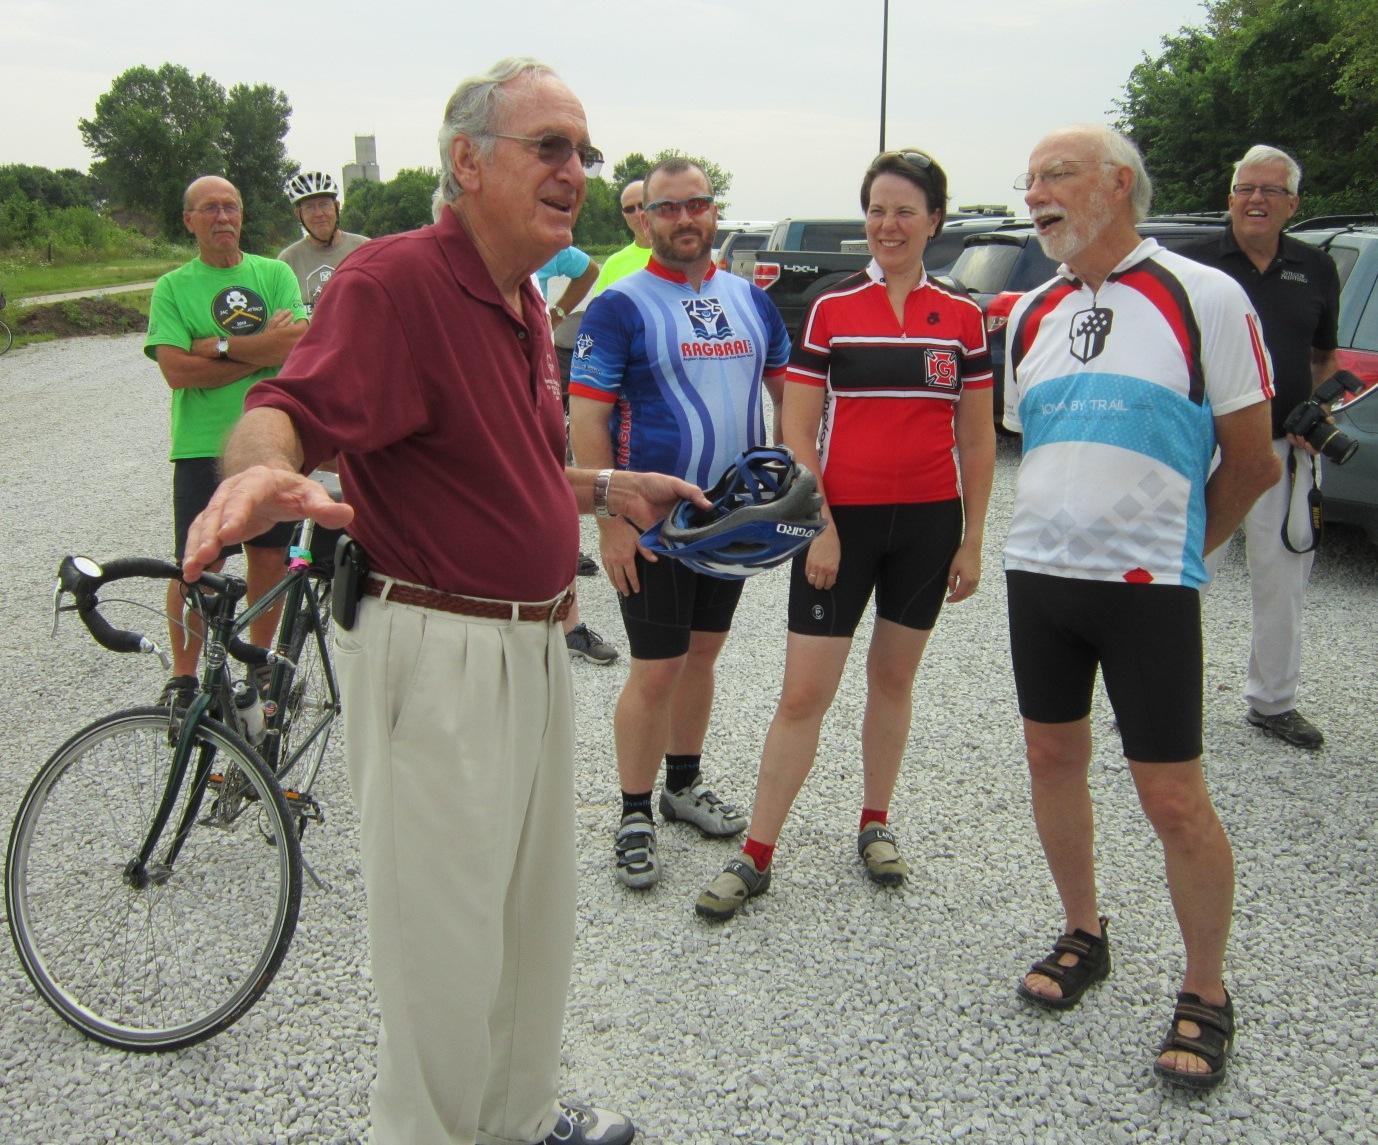 2 Senator Tom Harkin Mark Ackelson & others.JPG